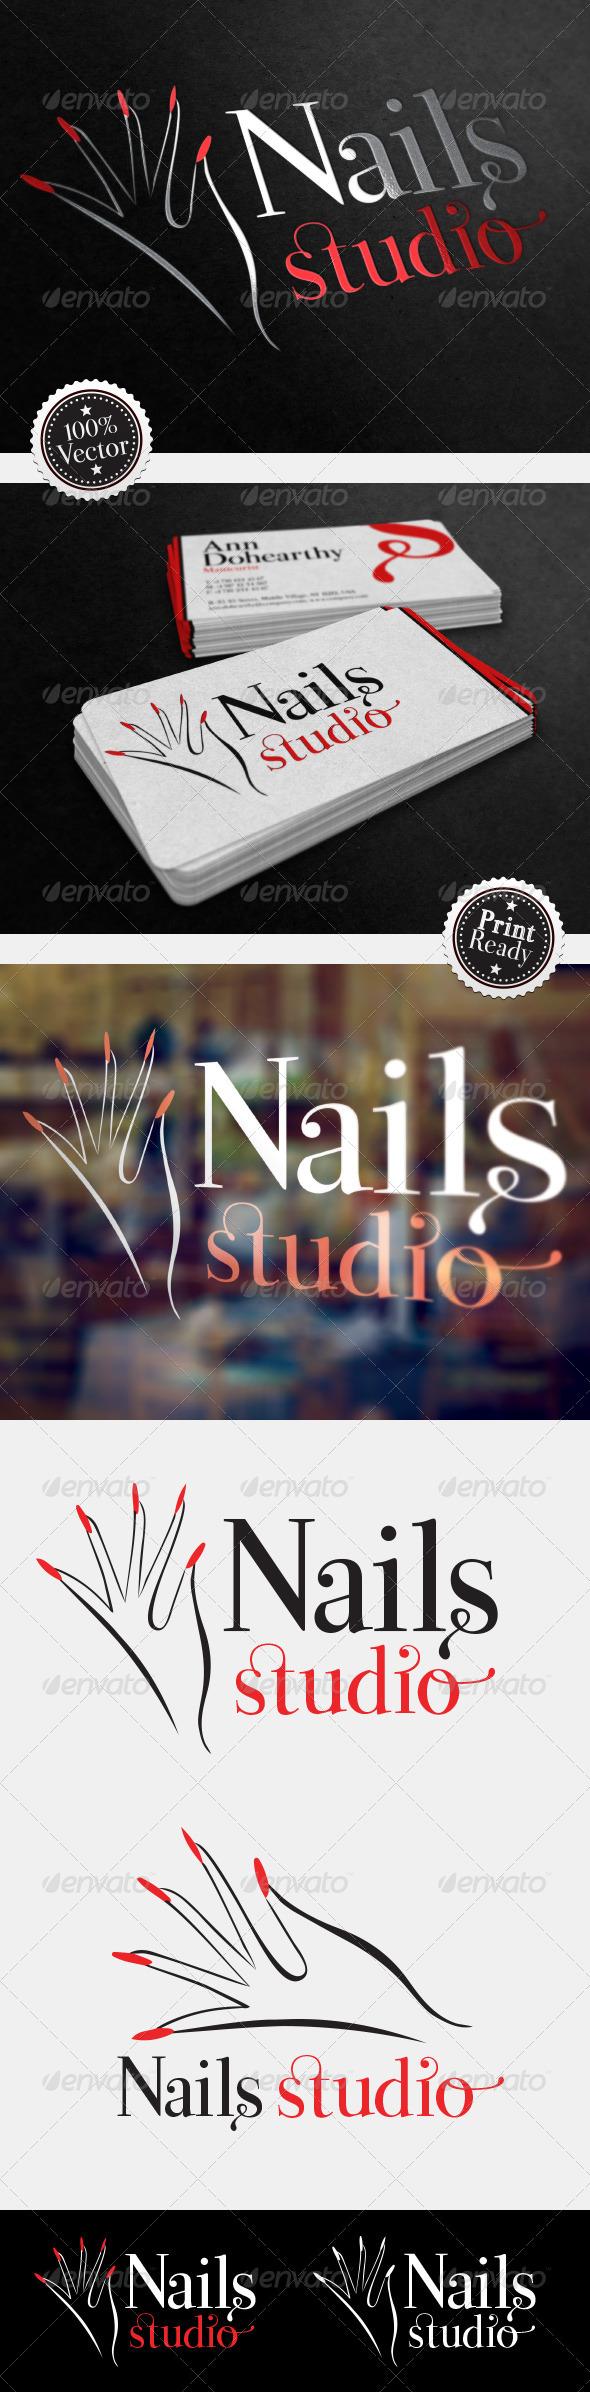 GraphicRiver Nails Studio Logo 5060087